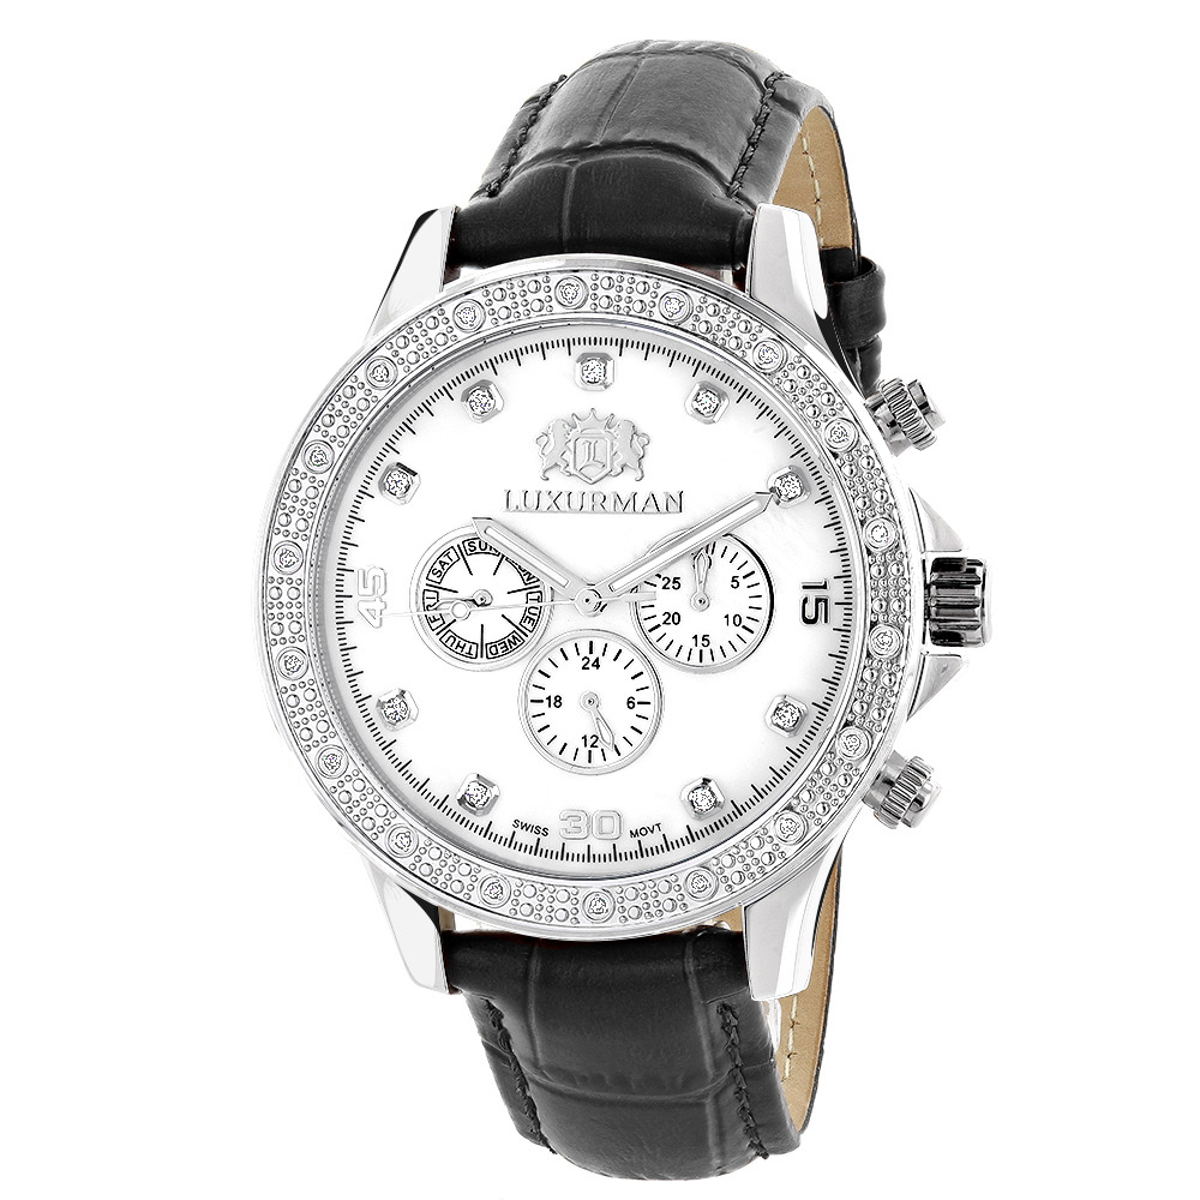 Luxurman Mens Diamond Watch 0.2ct Swiss Quartz Liberty w Leather Band